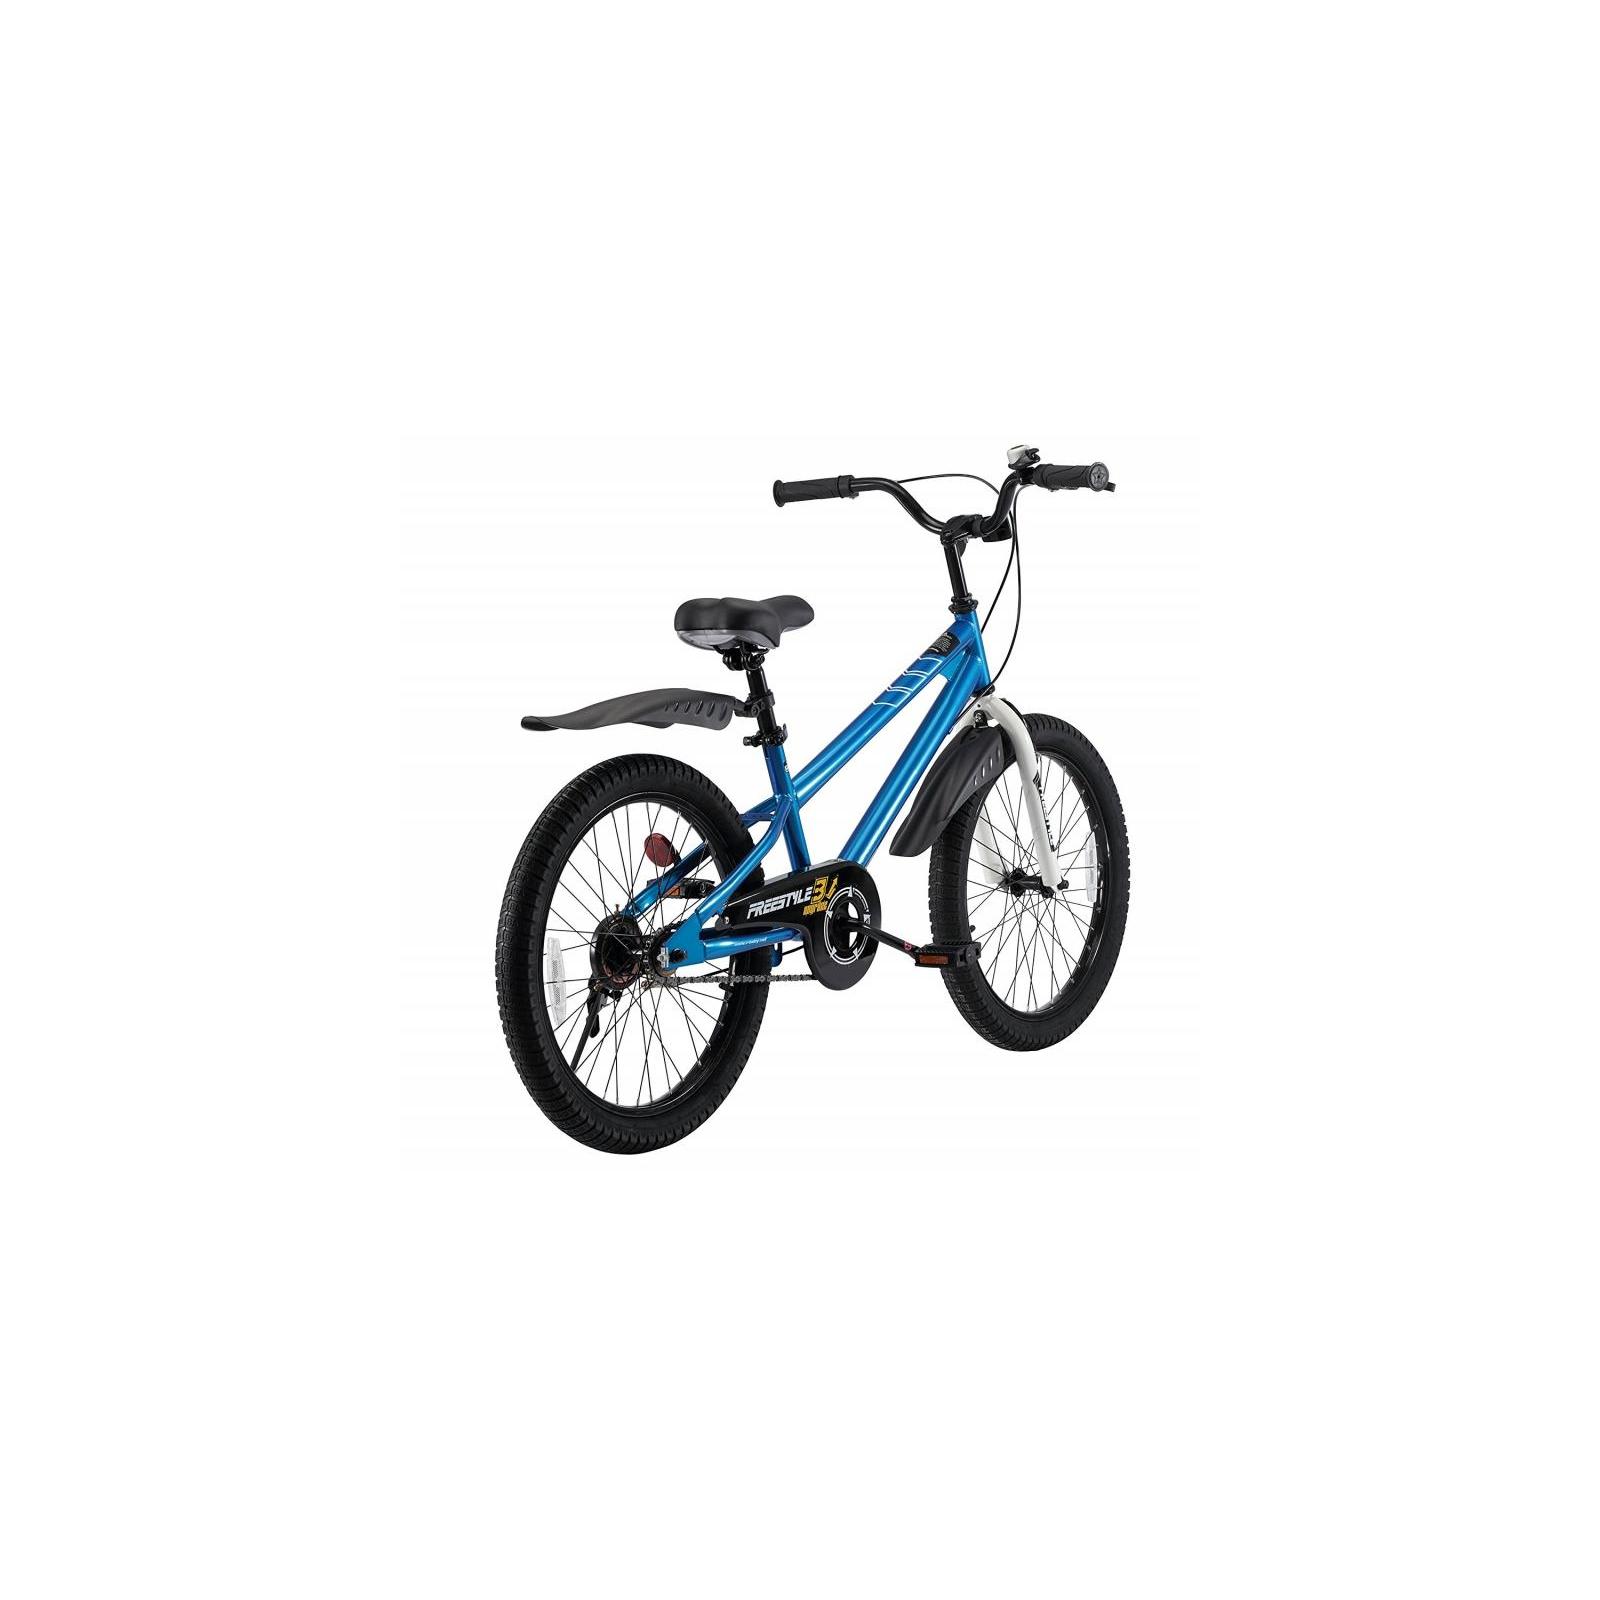 "Велосипед Royal Baby FREESTYLE 20"", синий (RB20B-6-BLU) изображение 2"